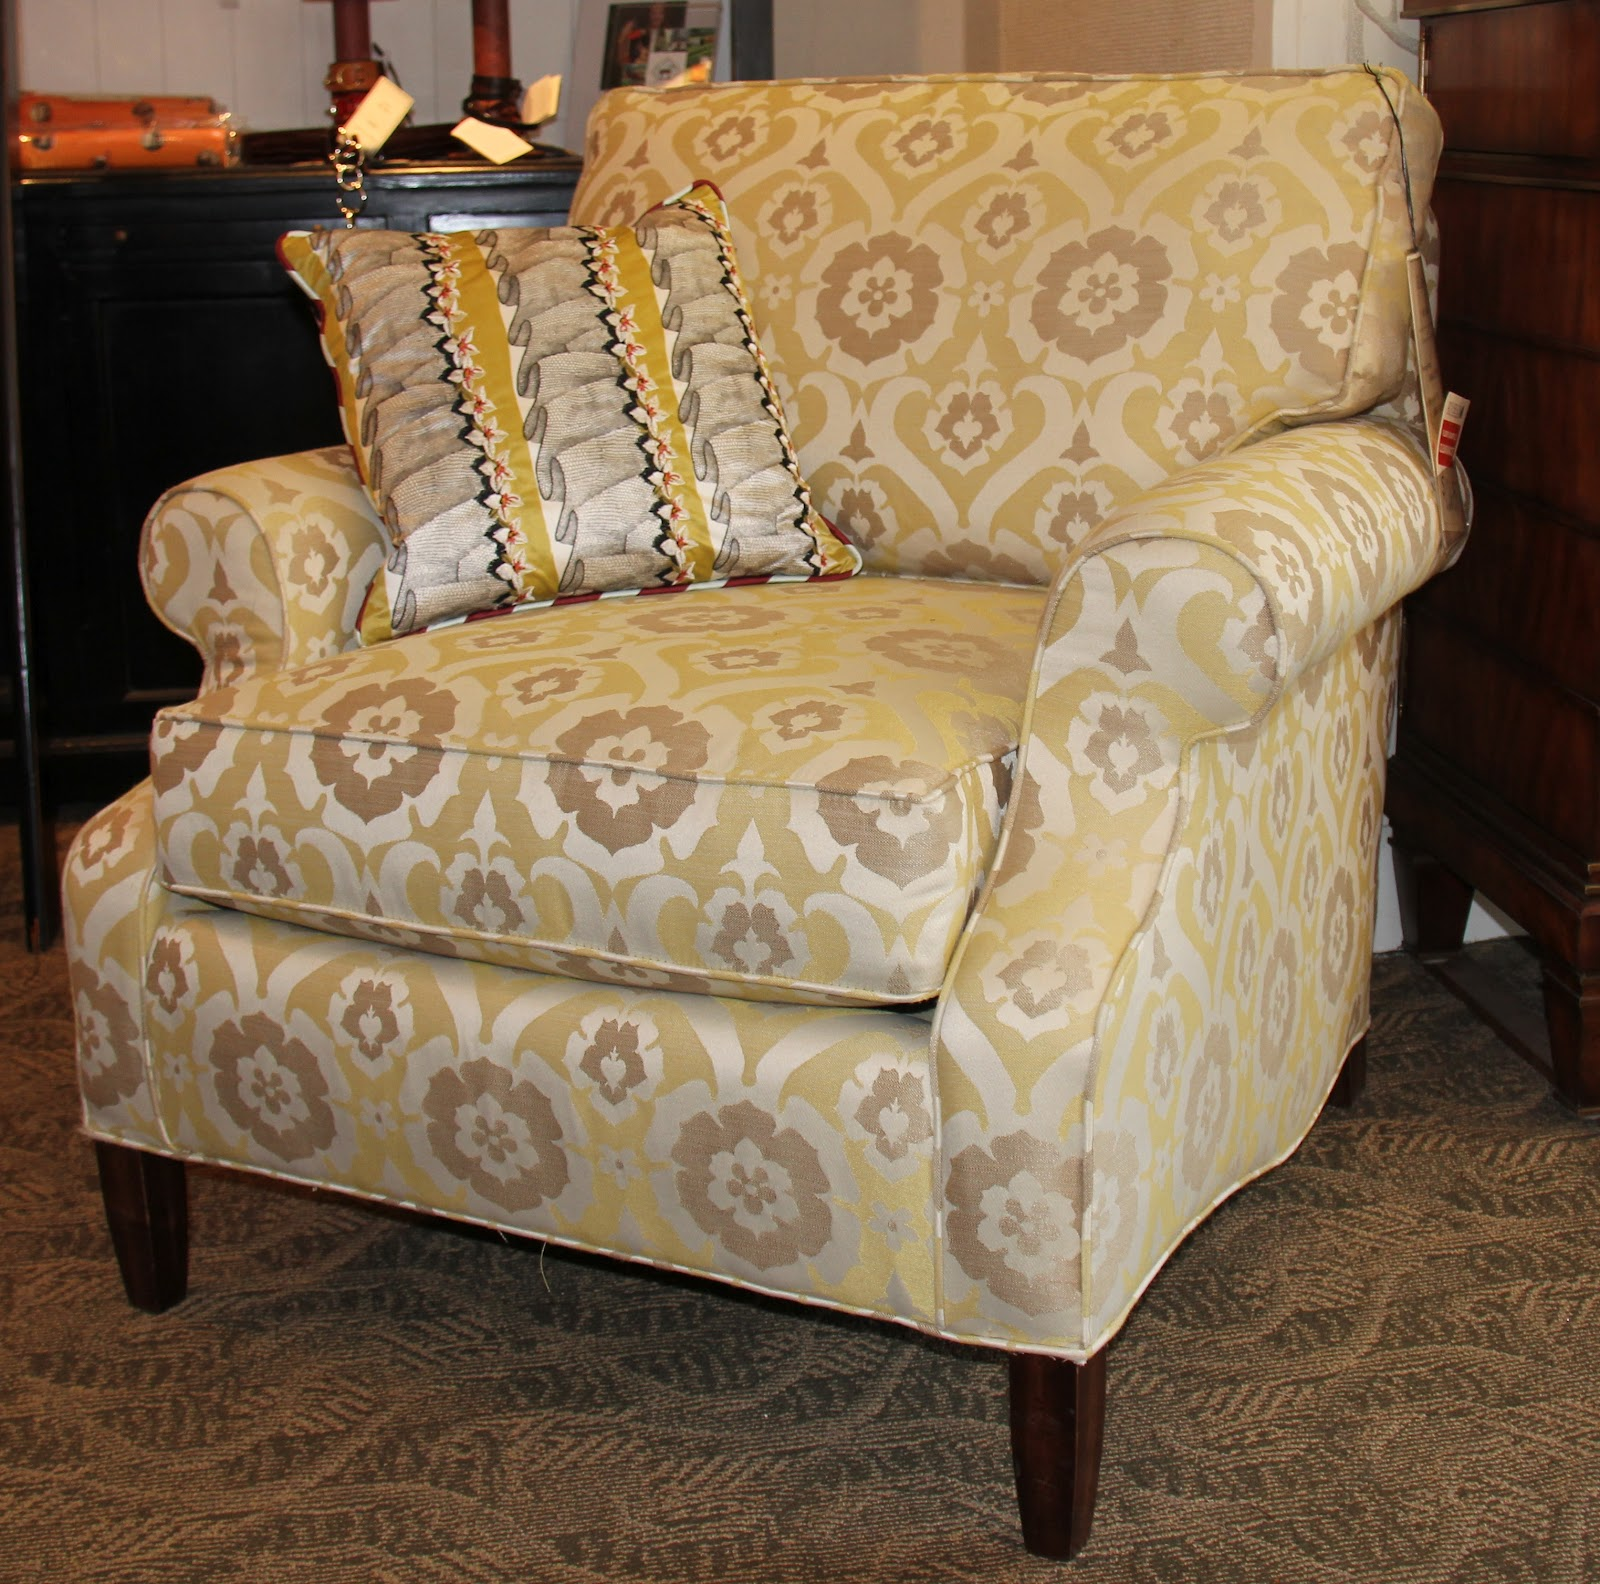 Rousseau S Fine Furniture And Decor Fall Blowout Sale